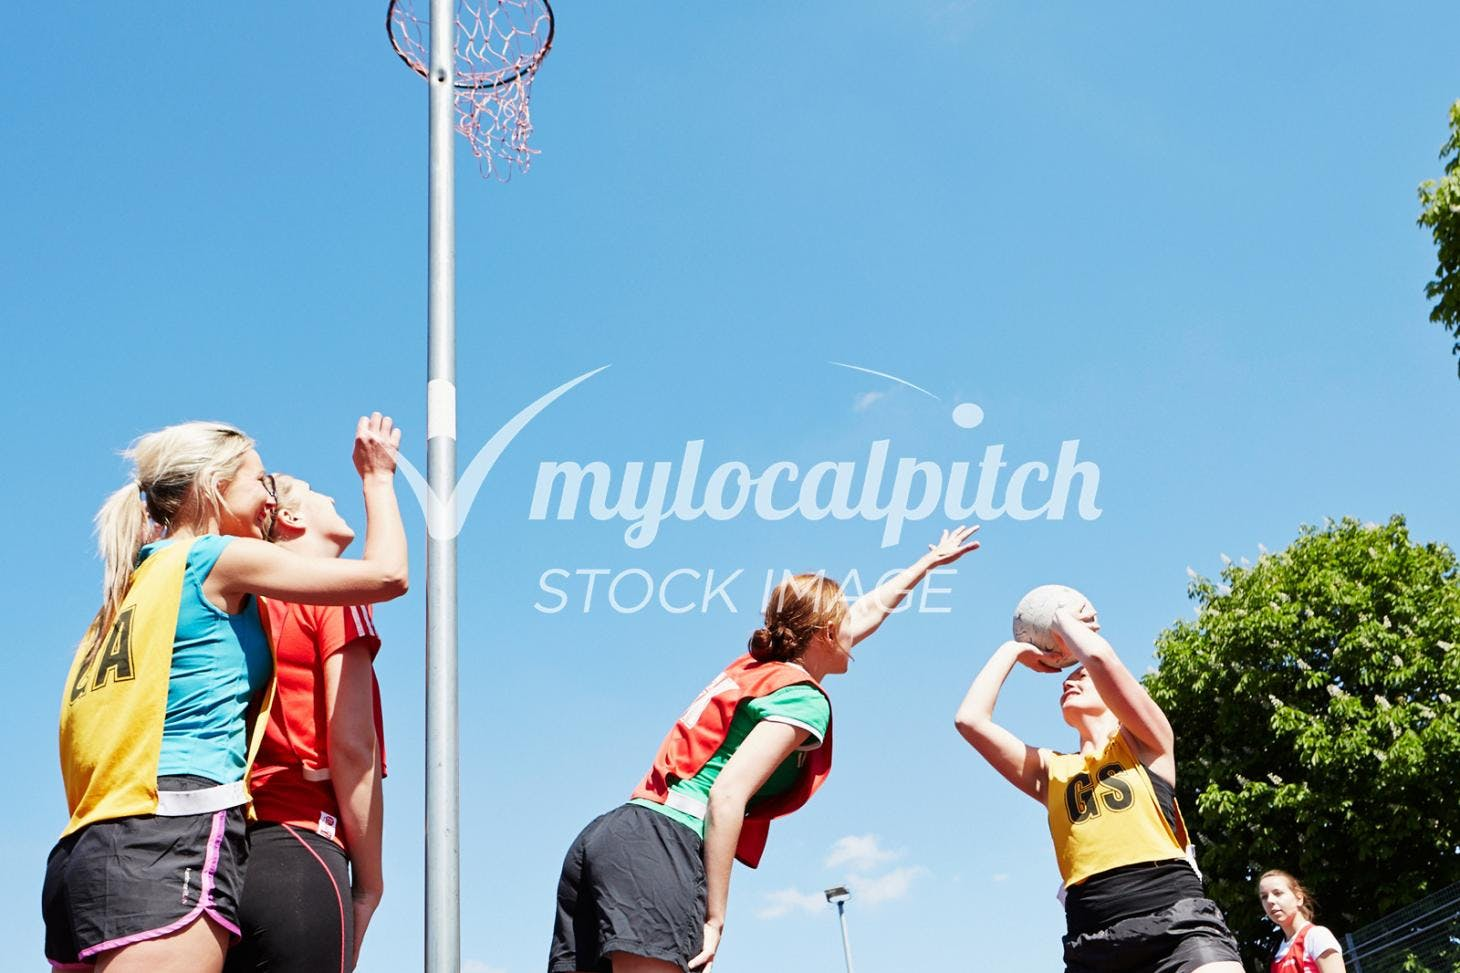 Alfred Major Recreation Ground Outdoor | Hard (macadam) netball court